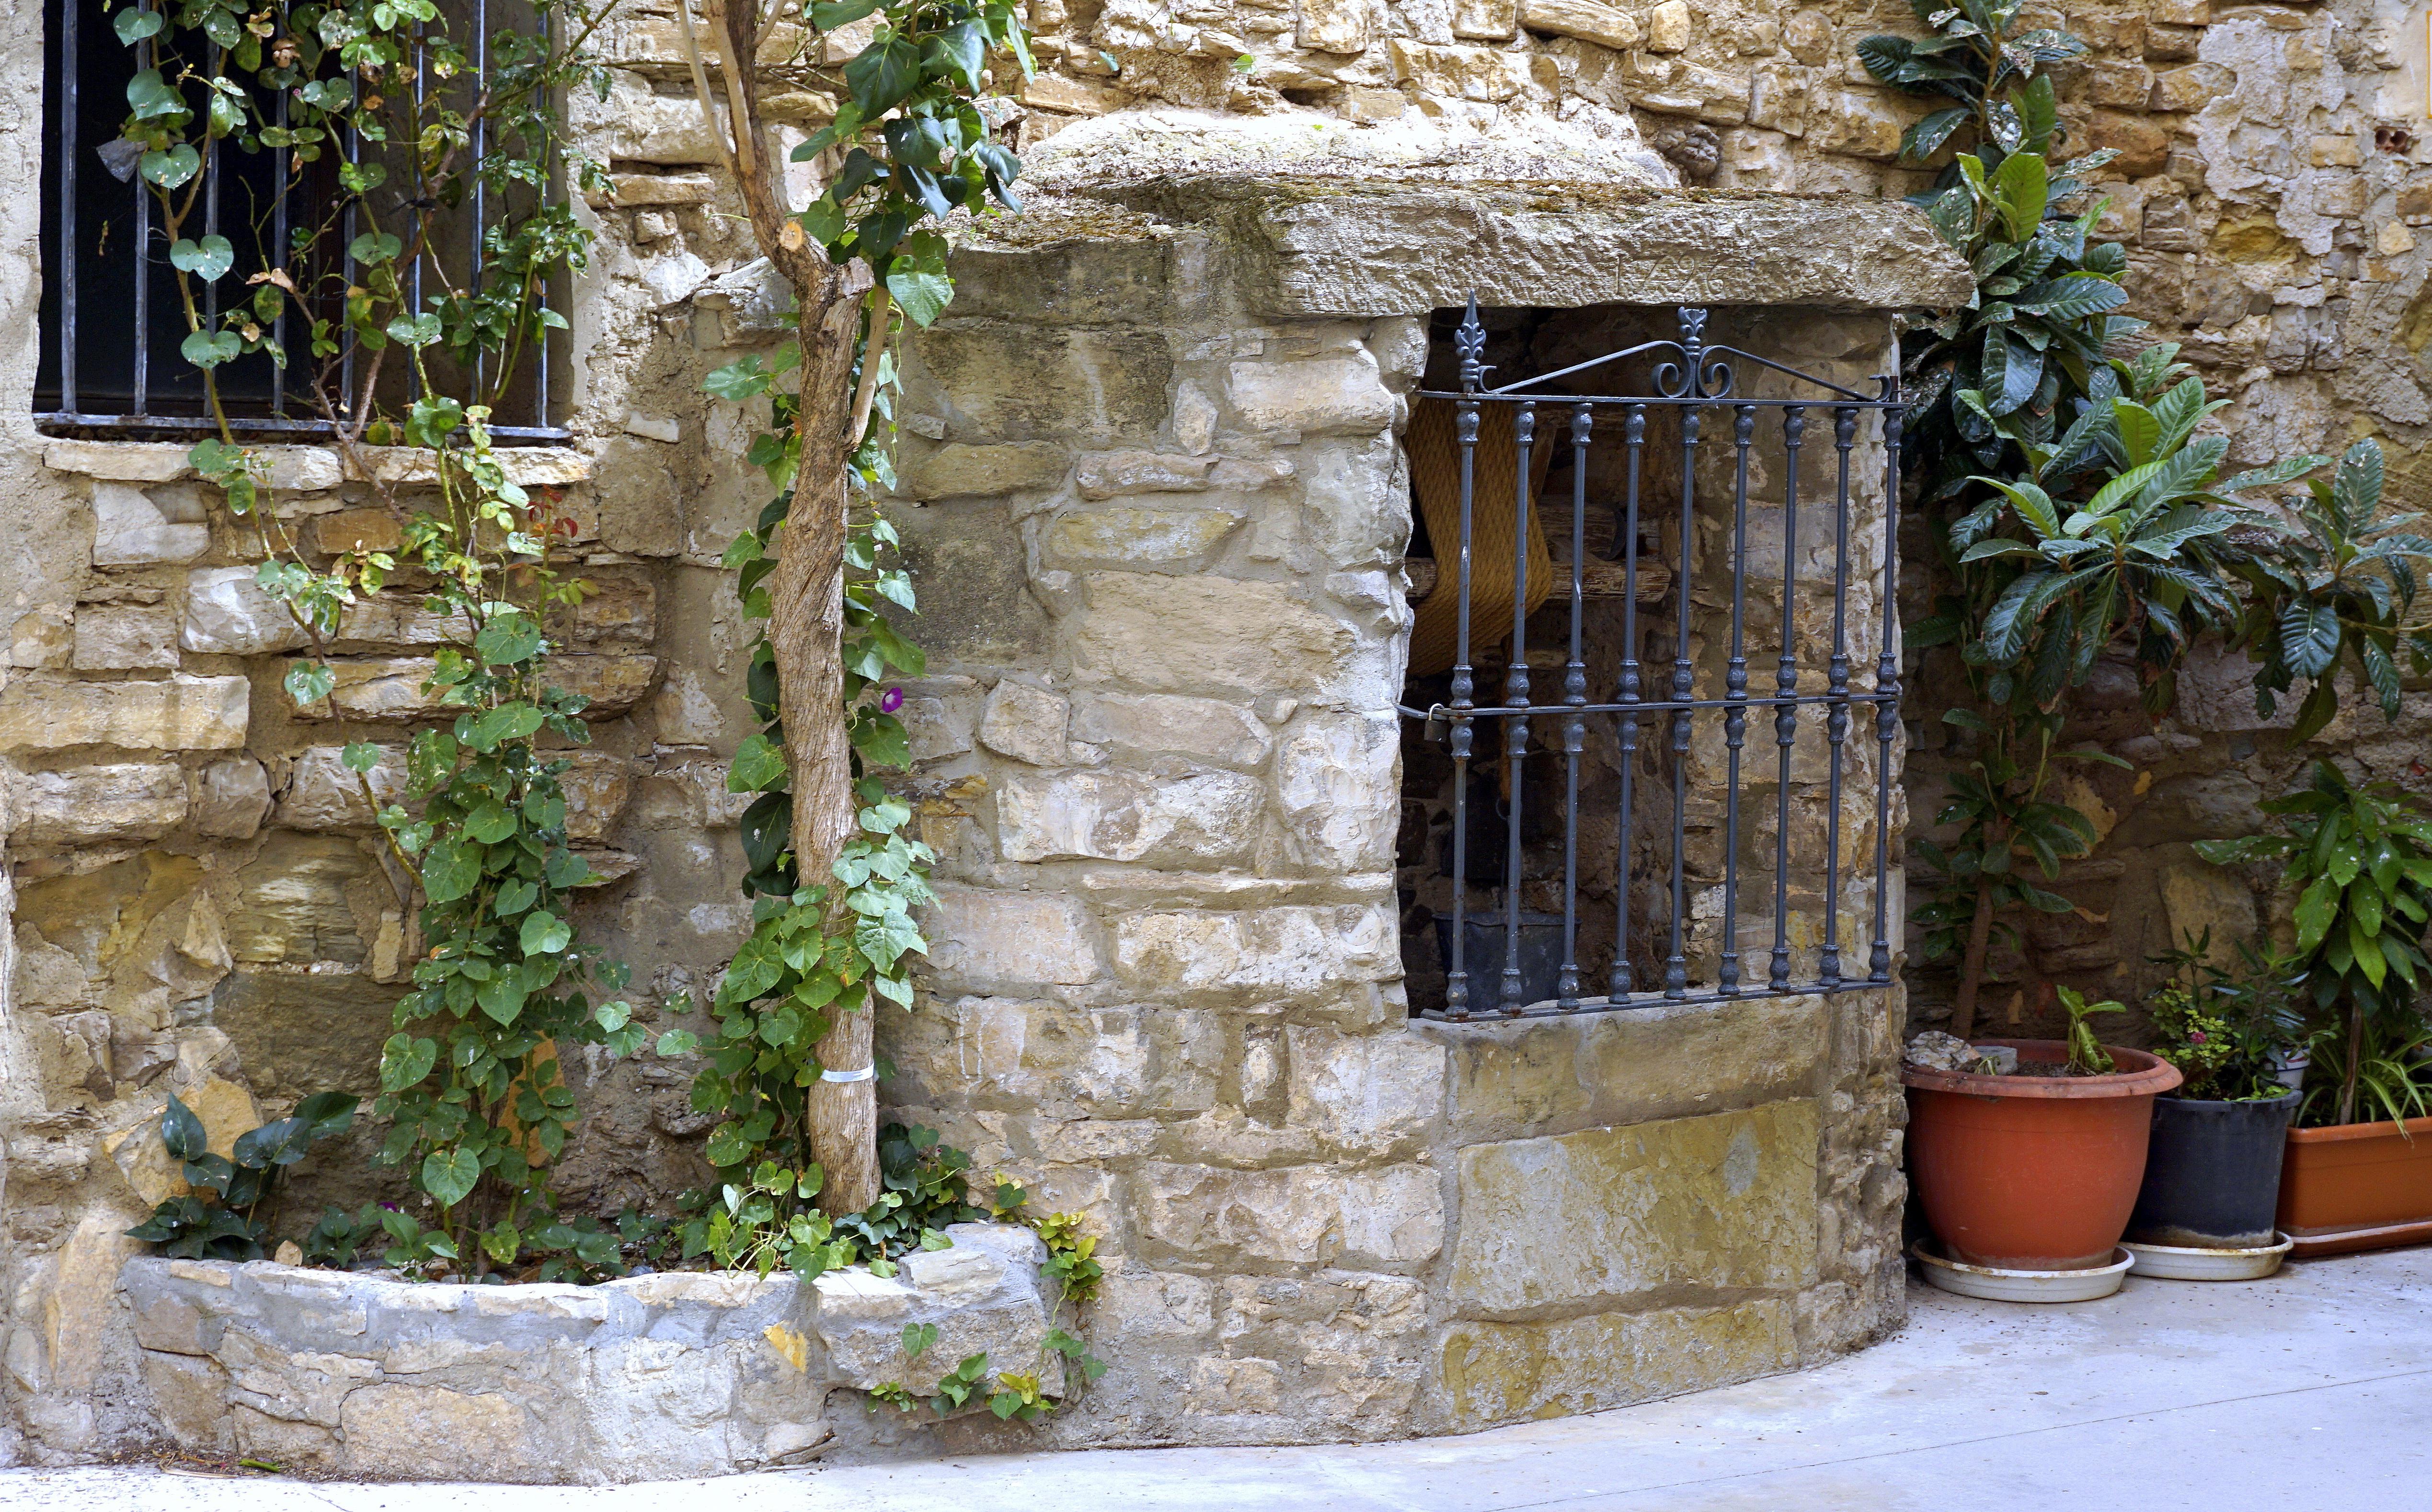 agua rock estructura madera vendimia casa ventana antiguo huerta casa pared pueblo rural cabaa patio interior